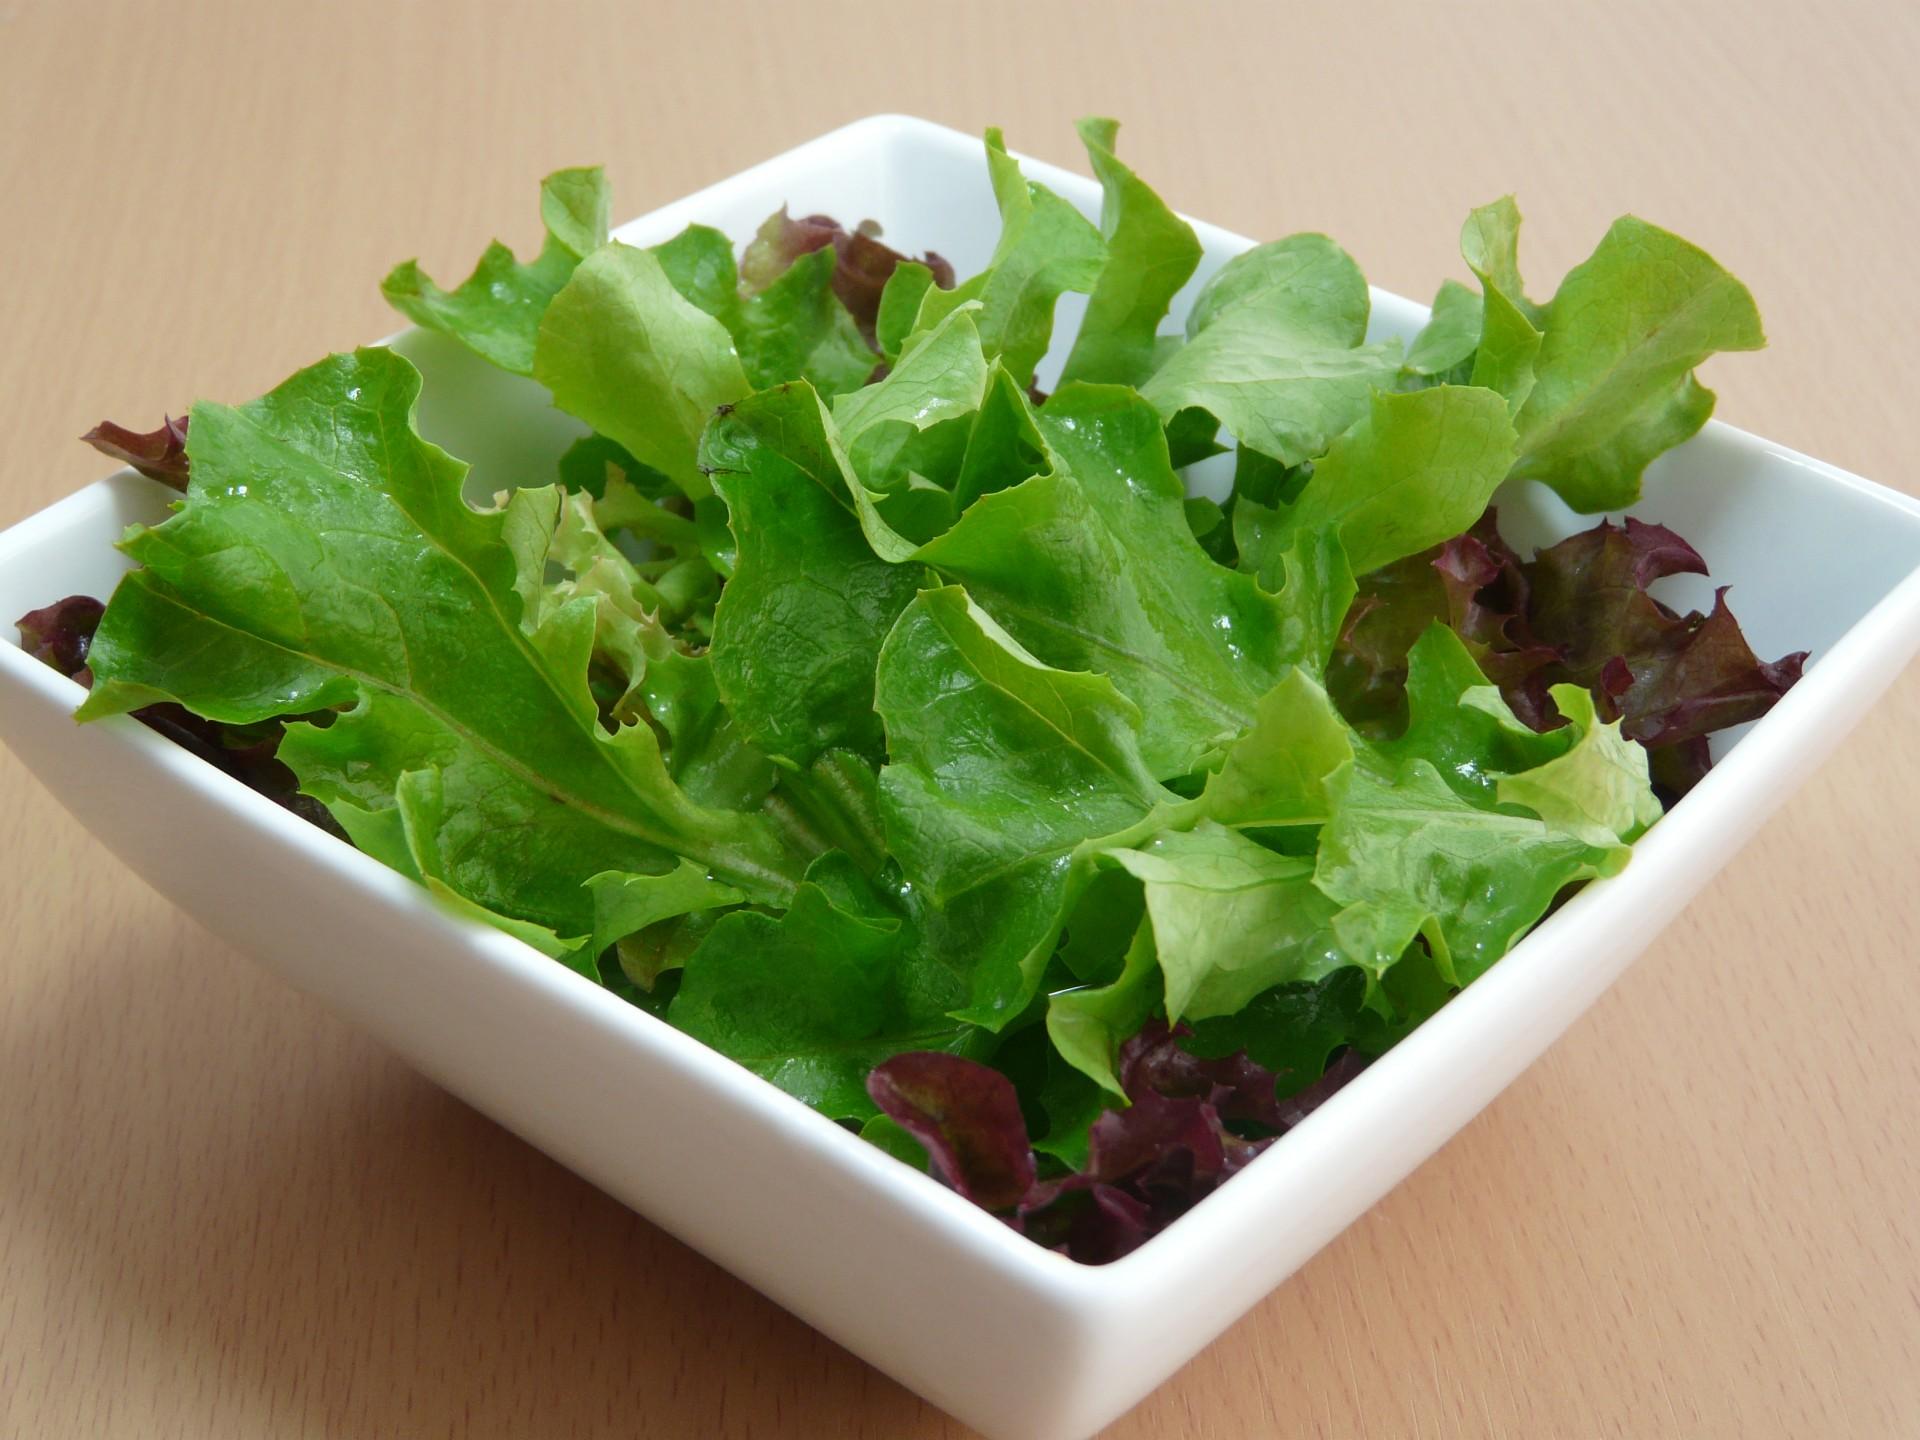 Salad Free Stock Photo - Public Domain Pictures